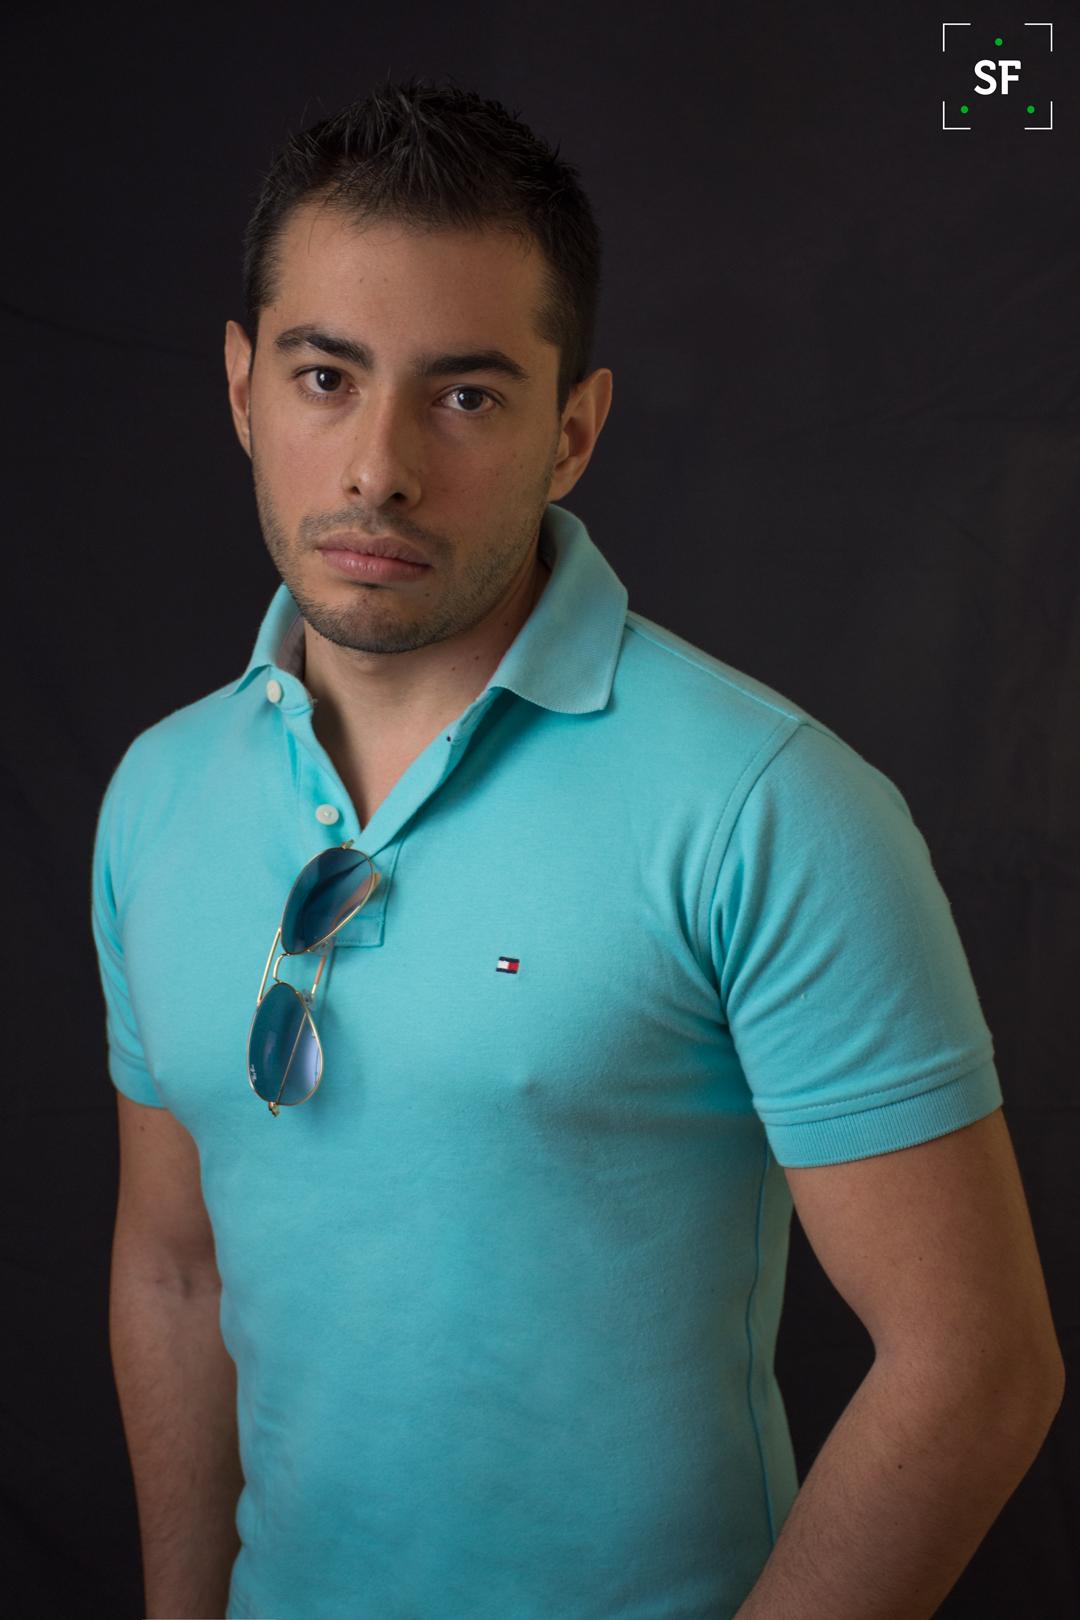 fotografía+fotógrafo+modelo+gay